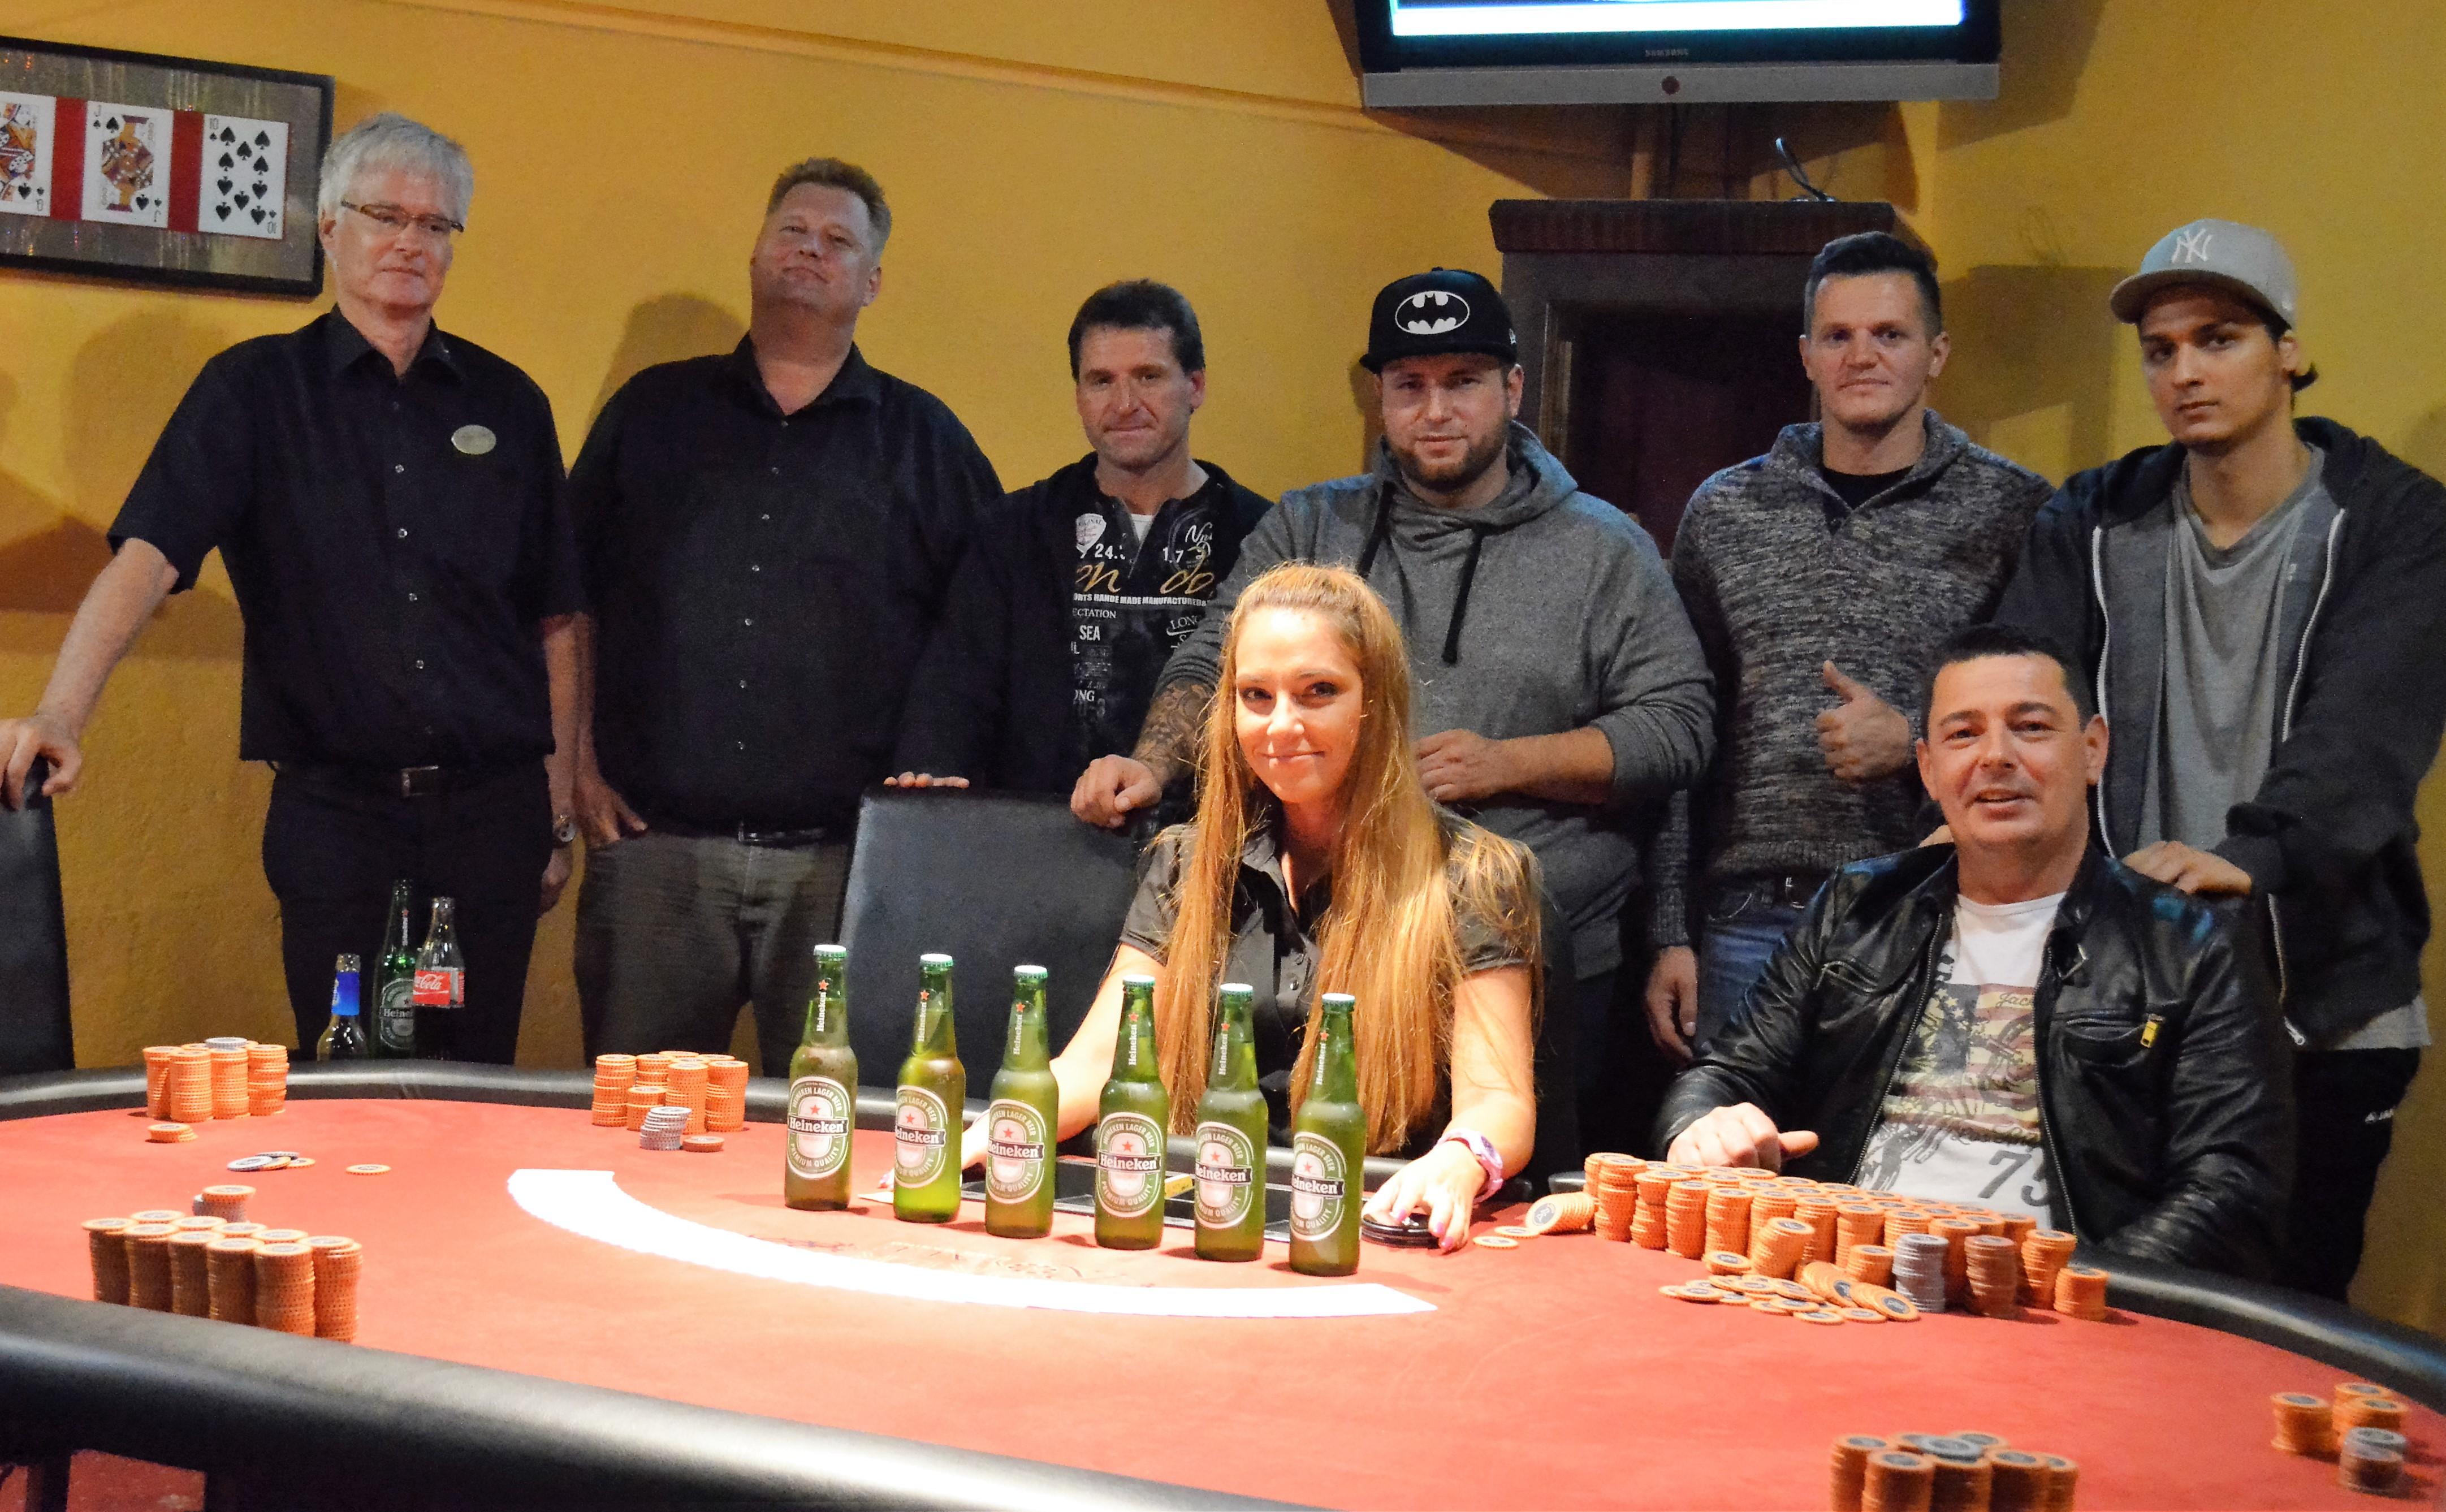 casino royal wr. neustadt